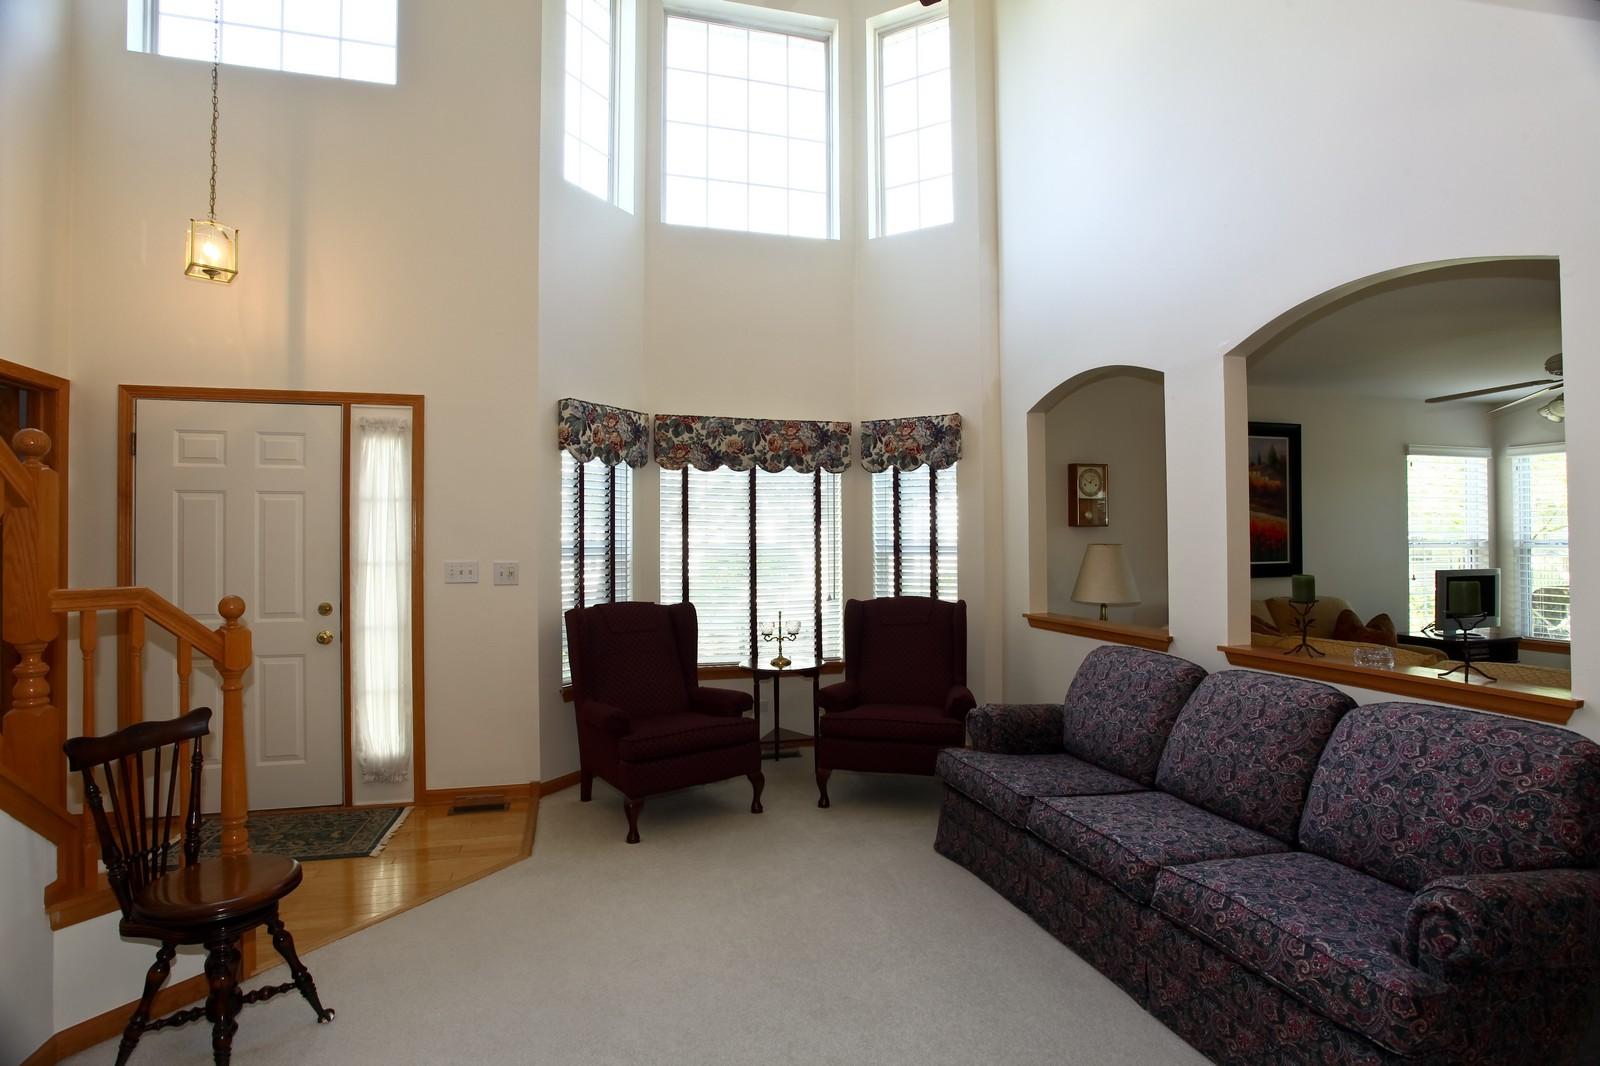 Real Estate Photography - 860 McKenzie Station Dr, Lisle, IL, 60532 - Living Room